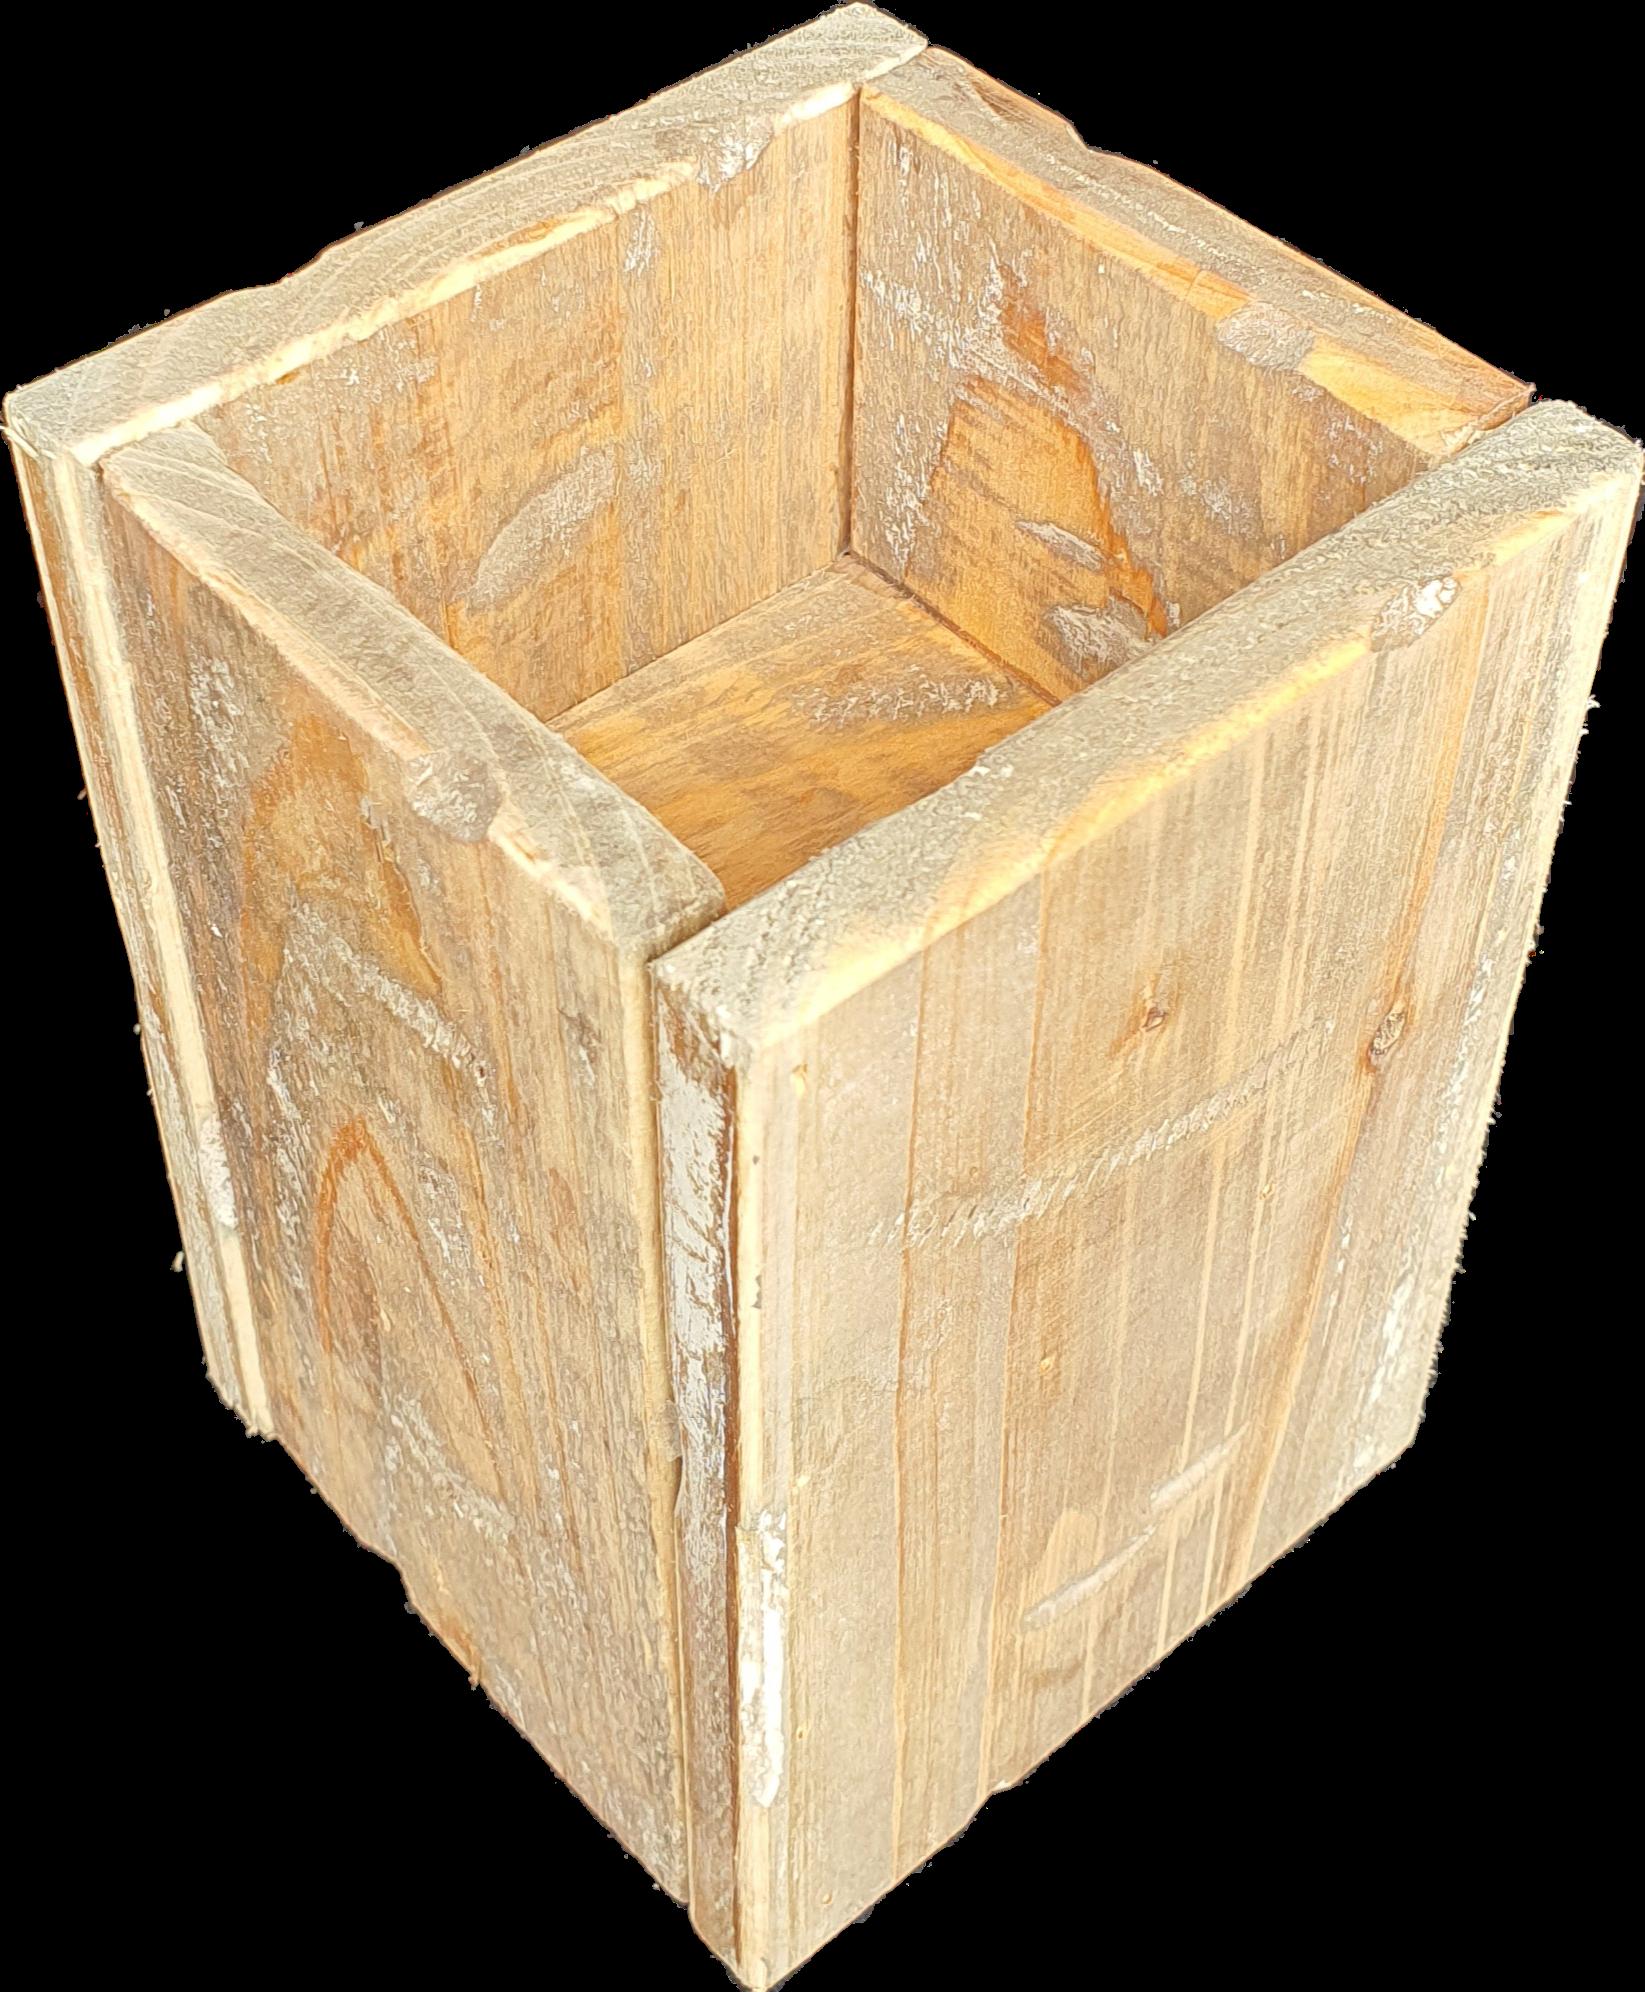 pot old dutchglass hold 2 sides 15-3